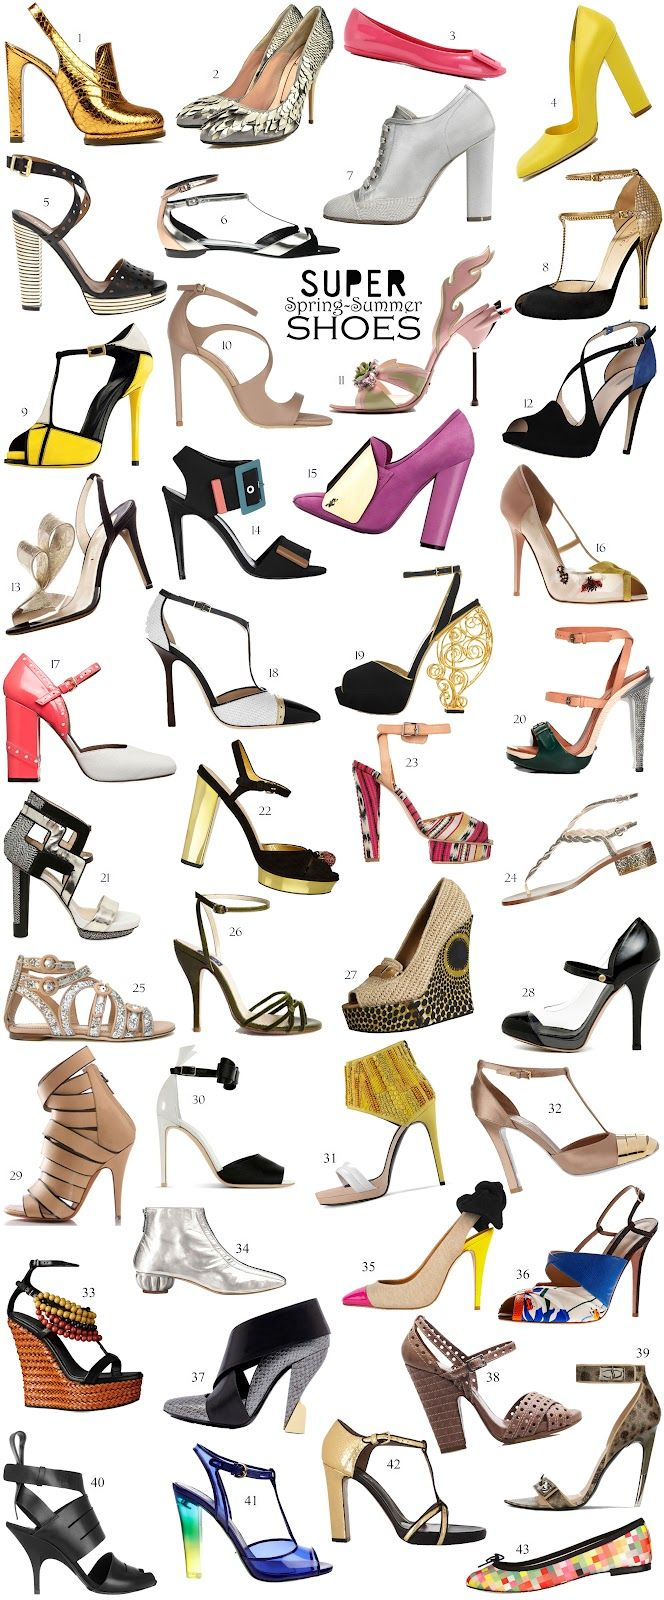 Fashion Zoom: Super Spring-Summer Shoes 2012 - ElectroMode